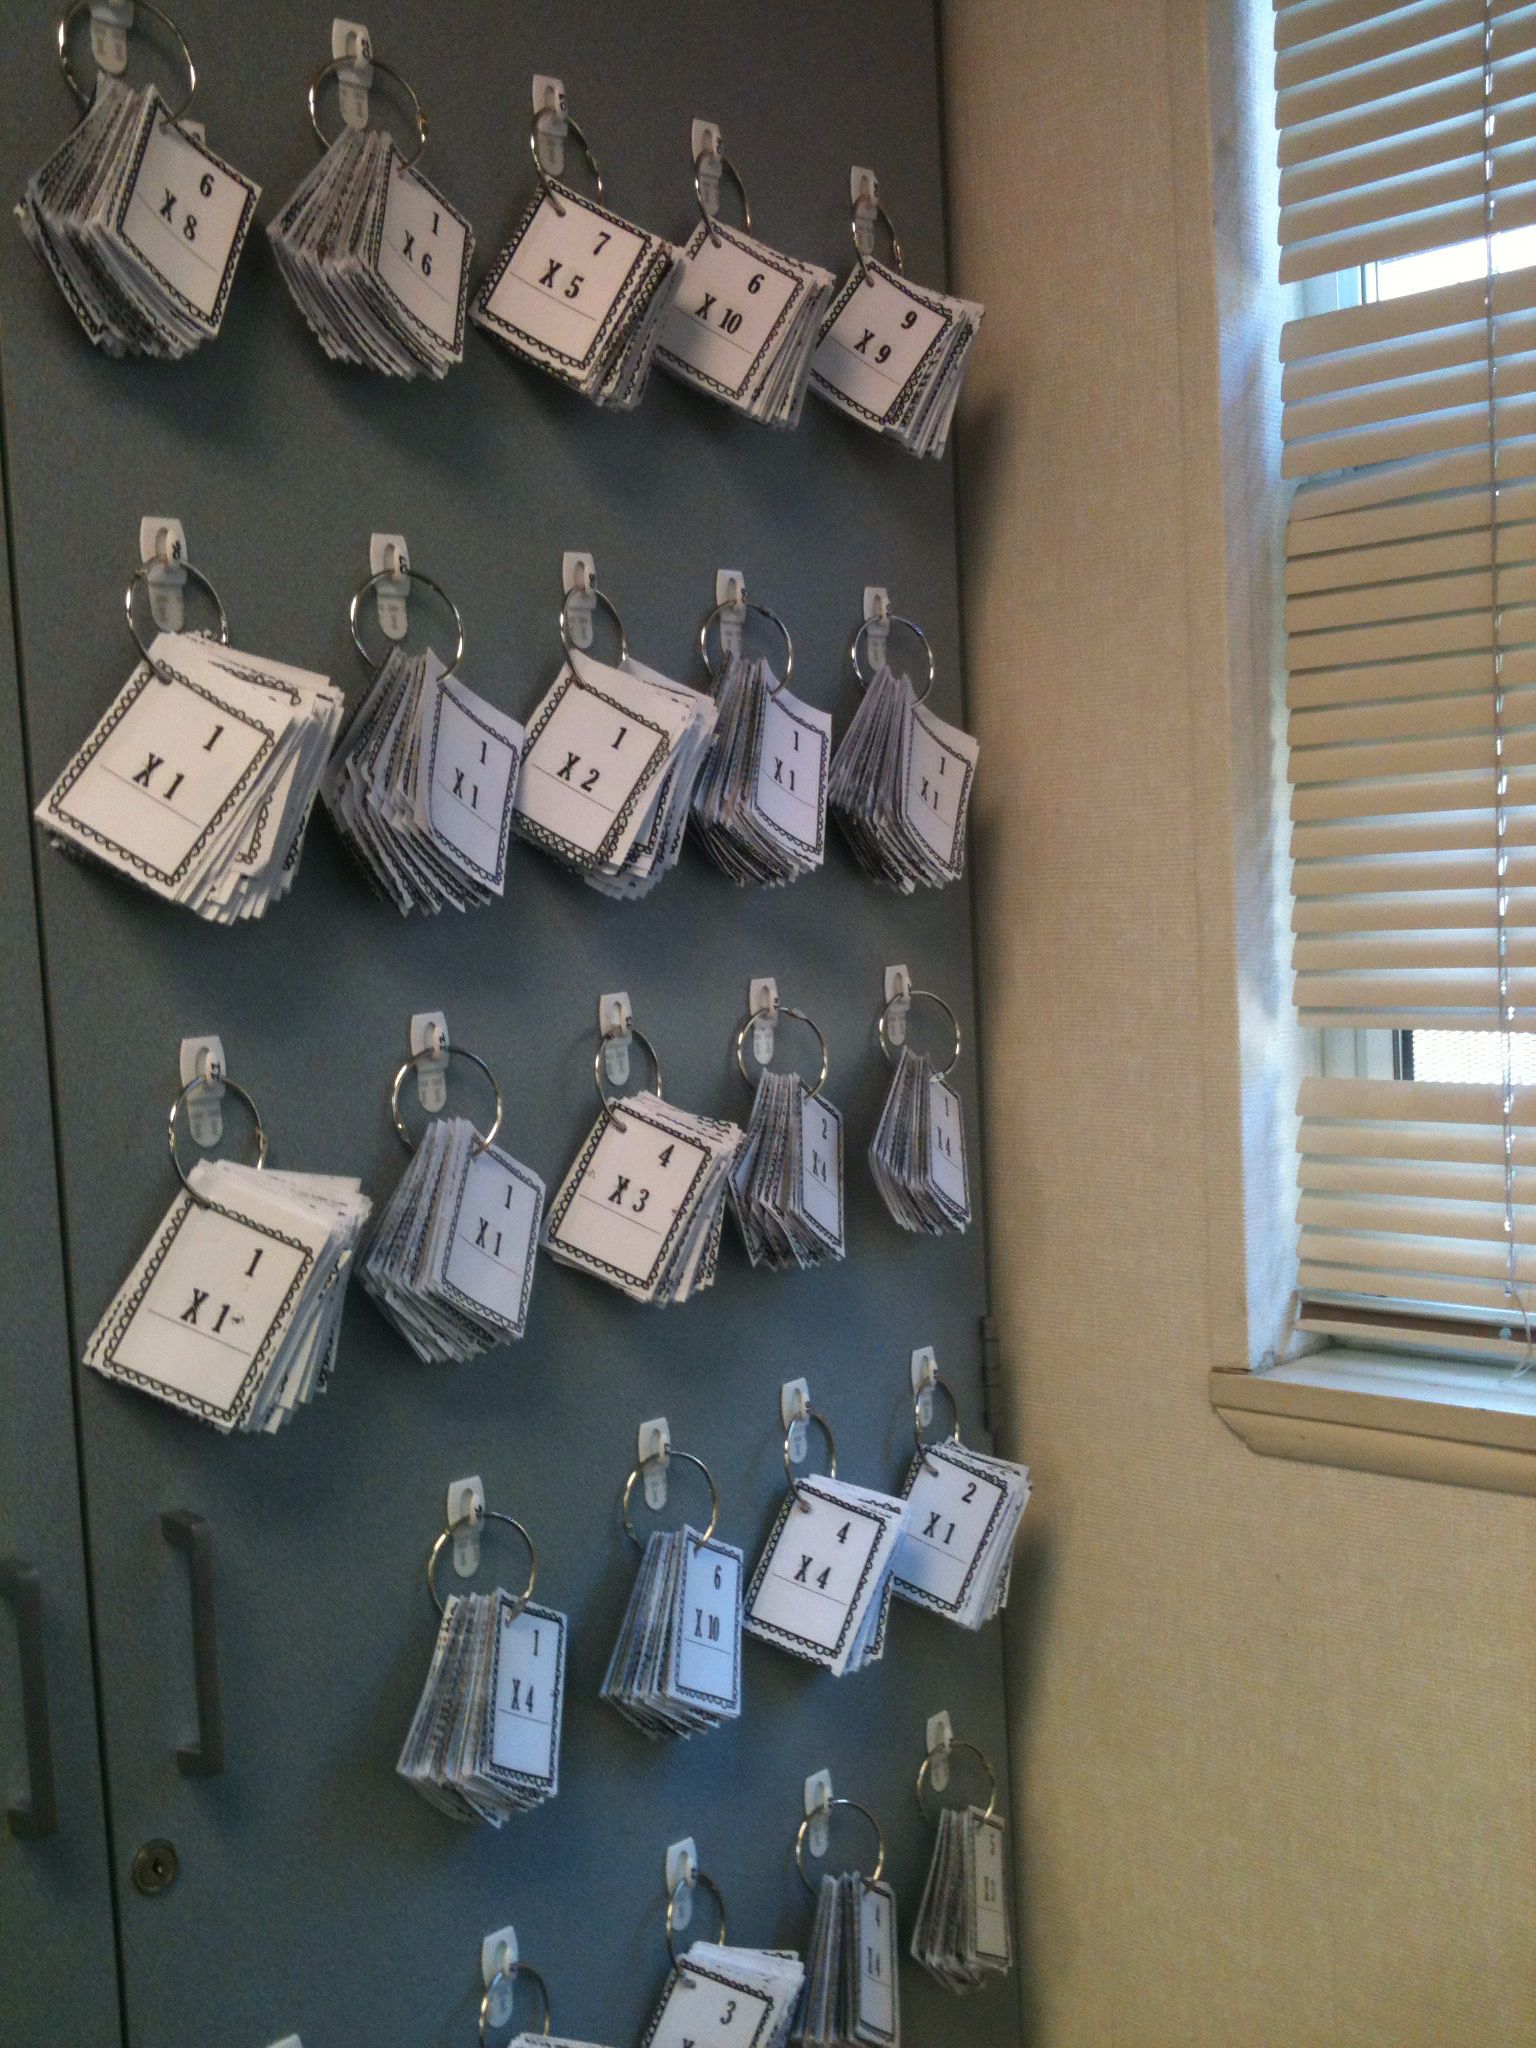 Flash Card Organization And Storage. I Used 3M Hooks And